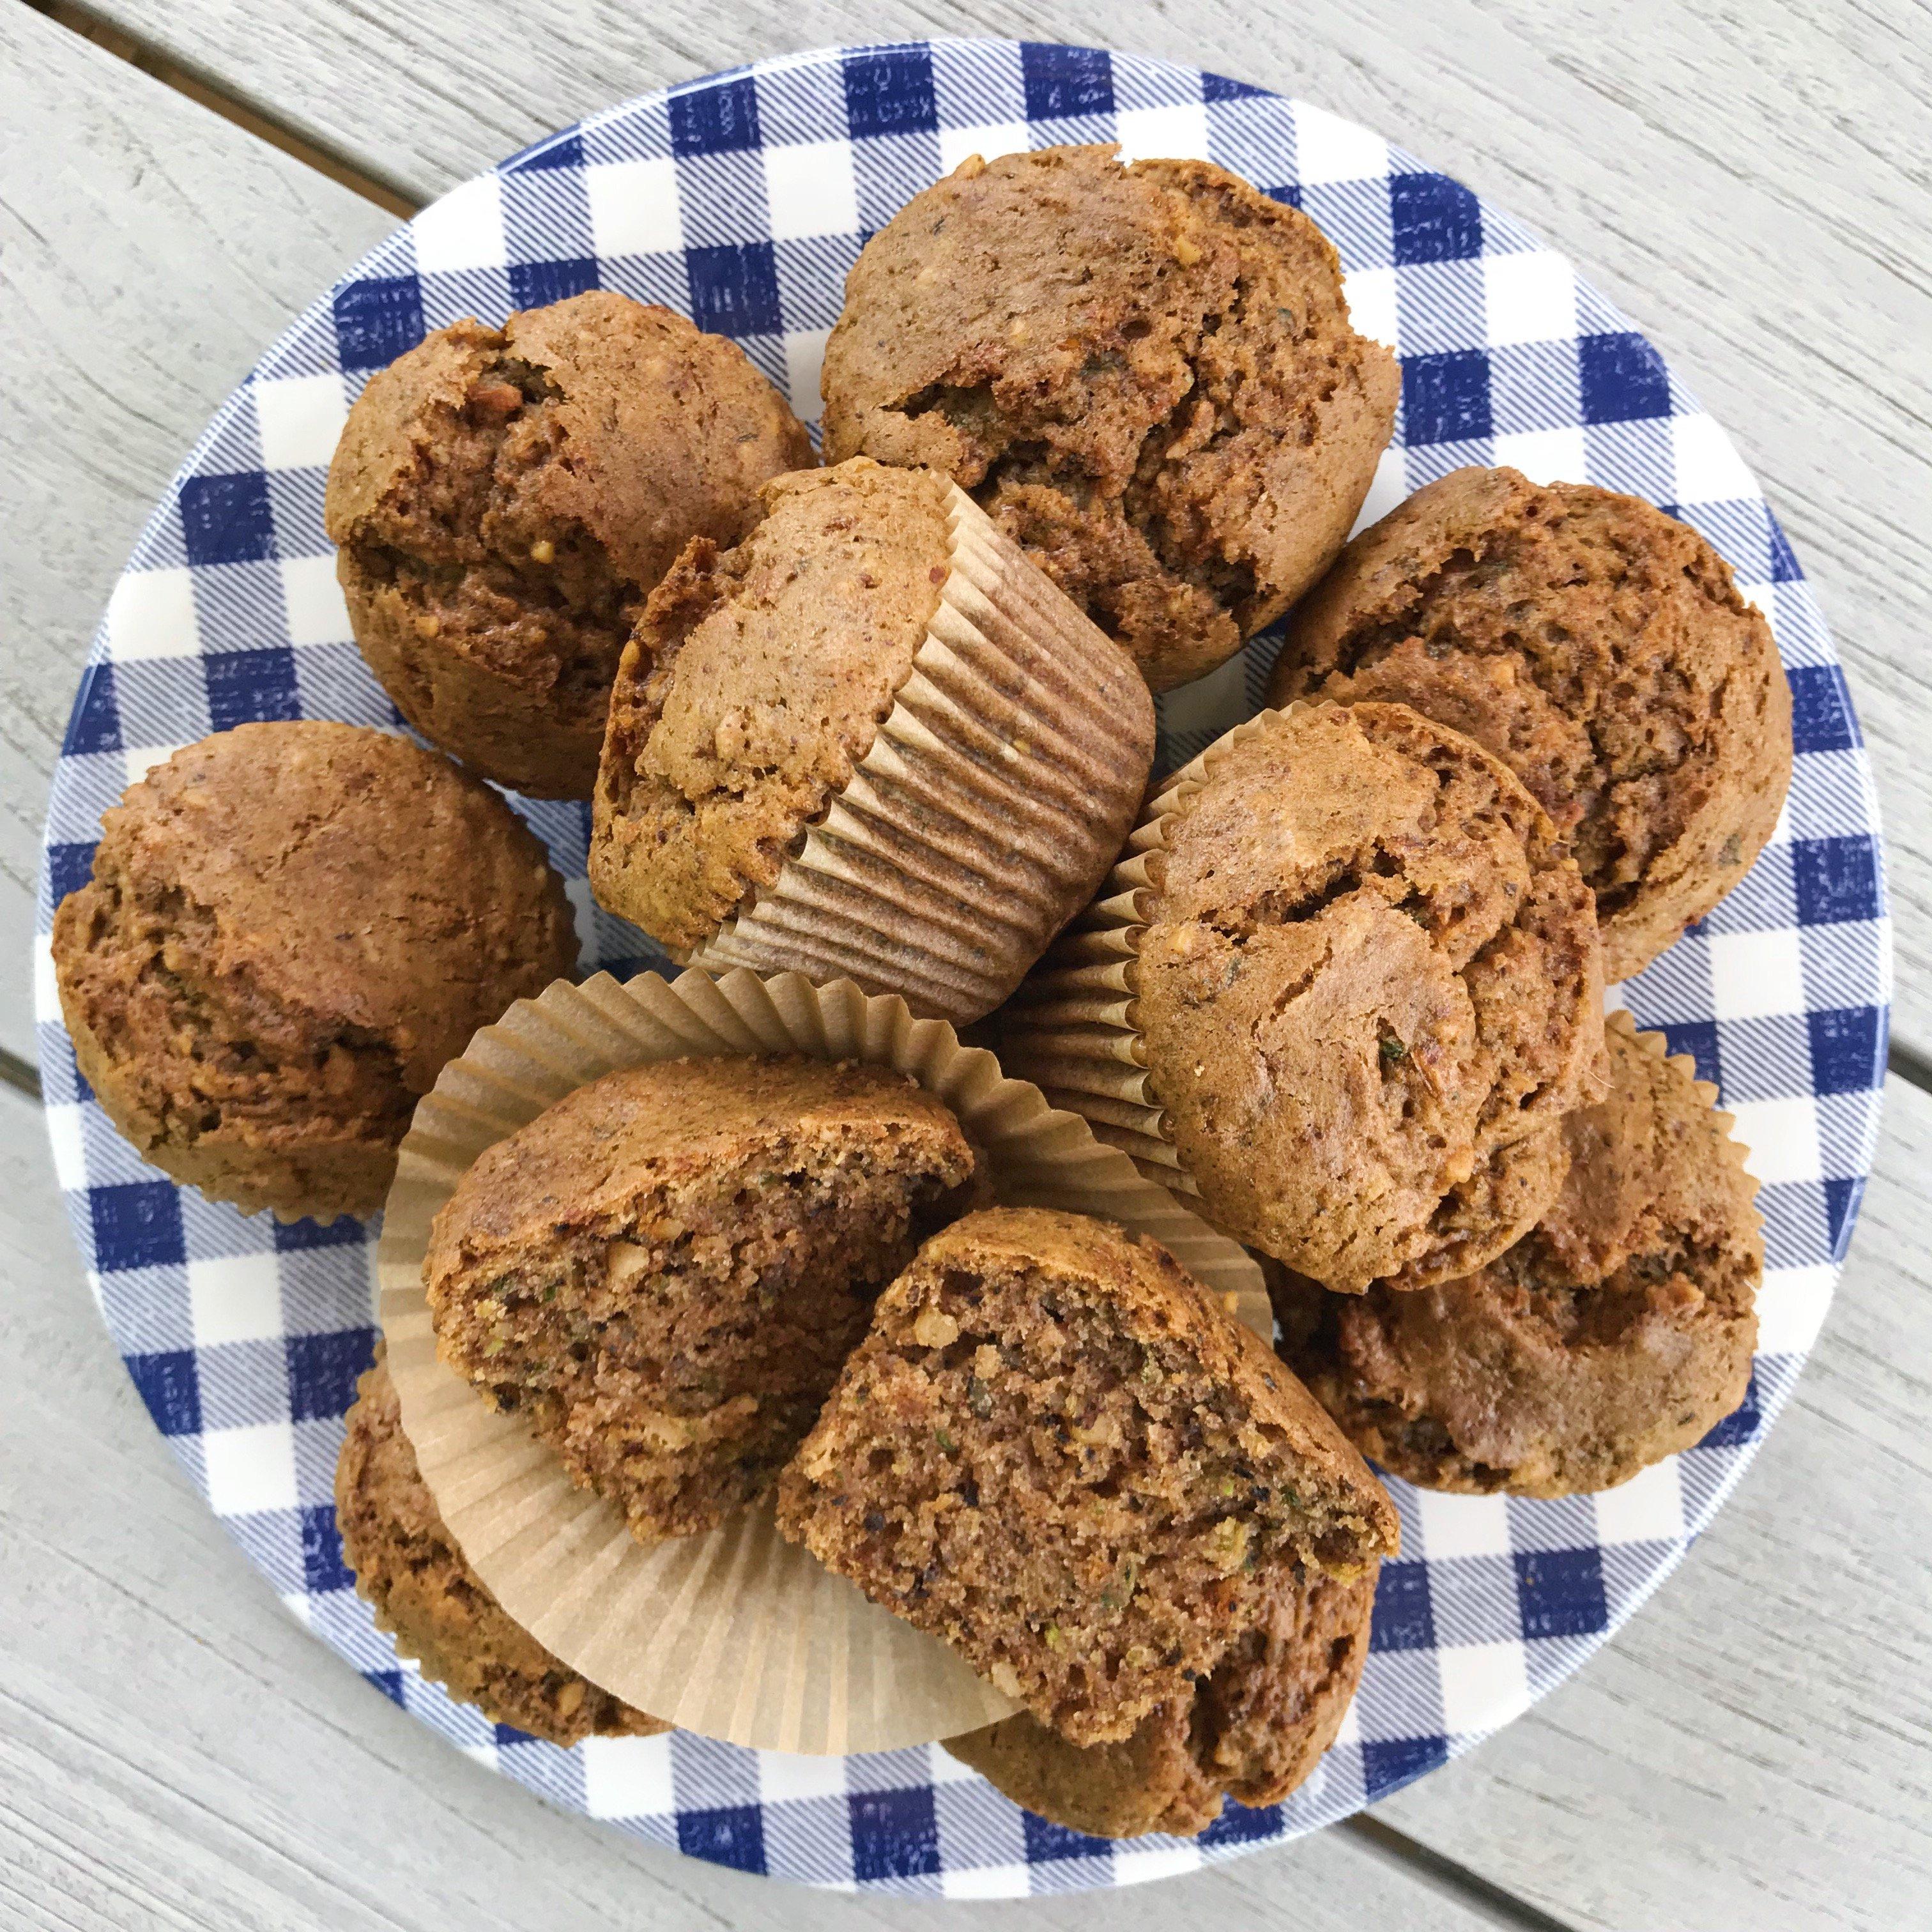 gluten-free zucchini muffins